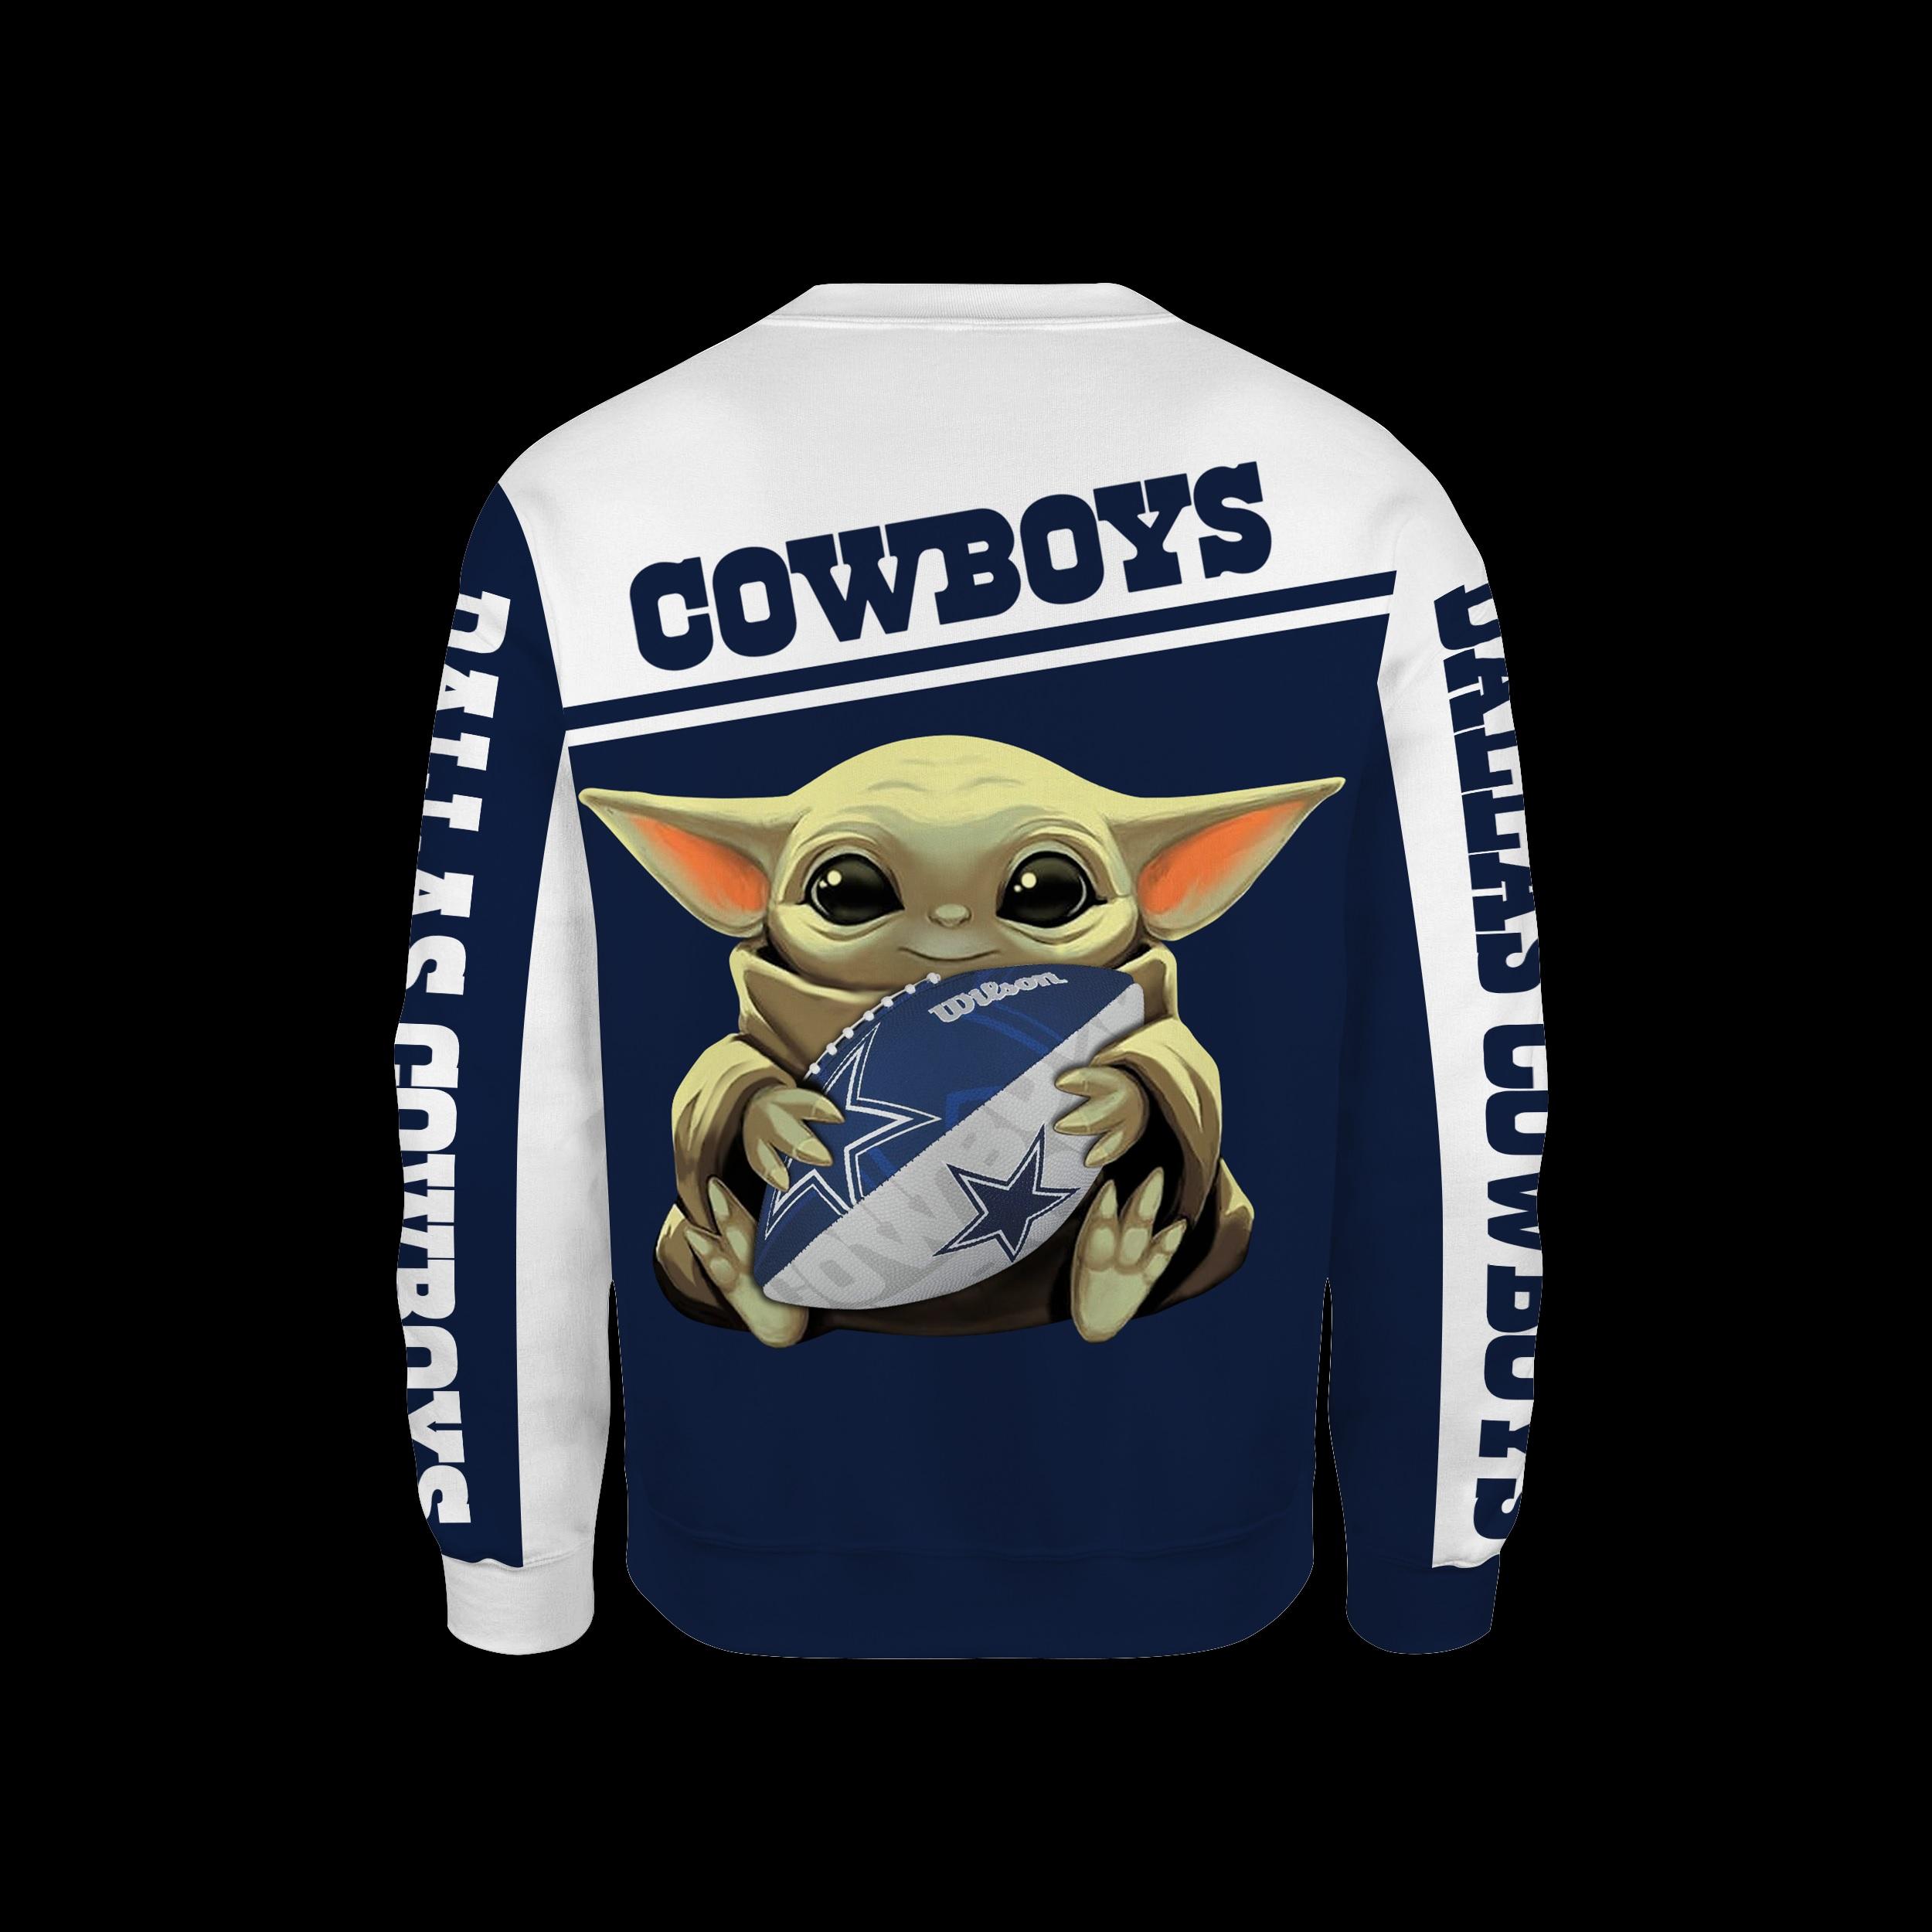 Dallas cowboys baby yoda all over print sweatshirt - back